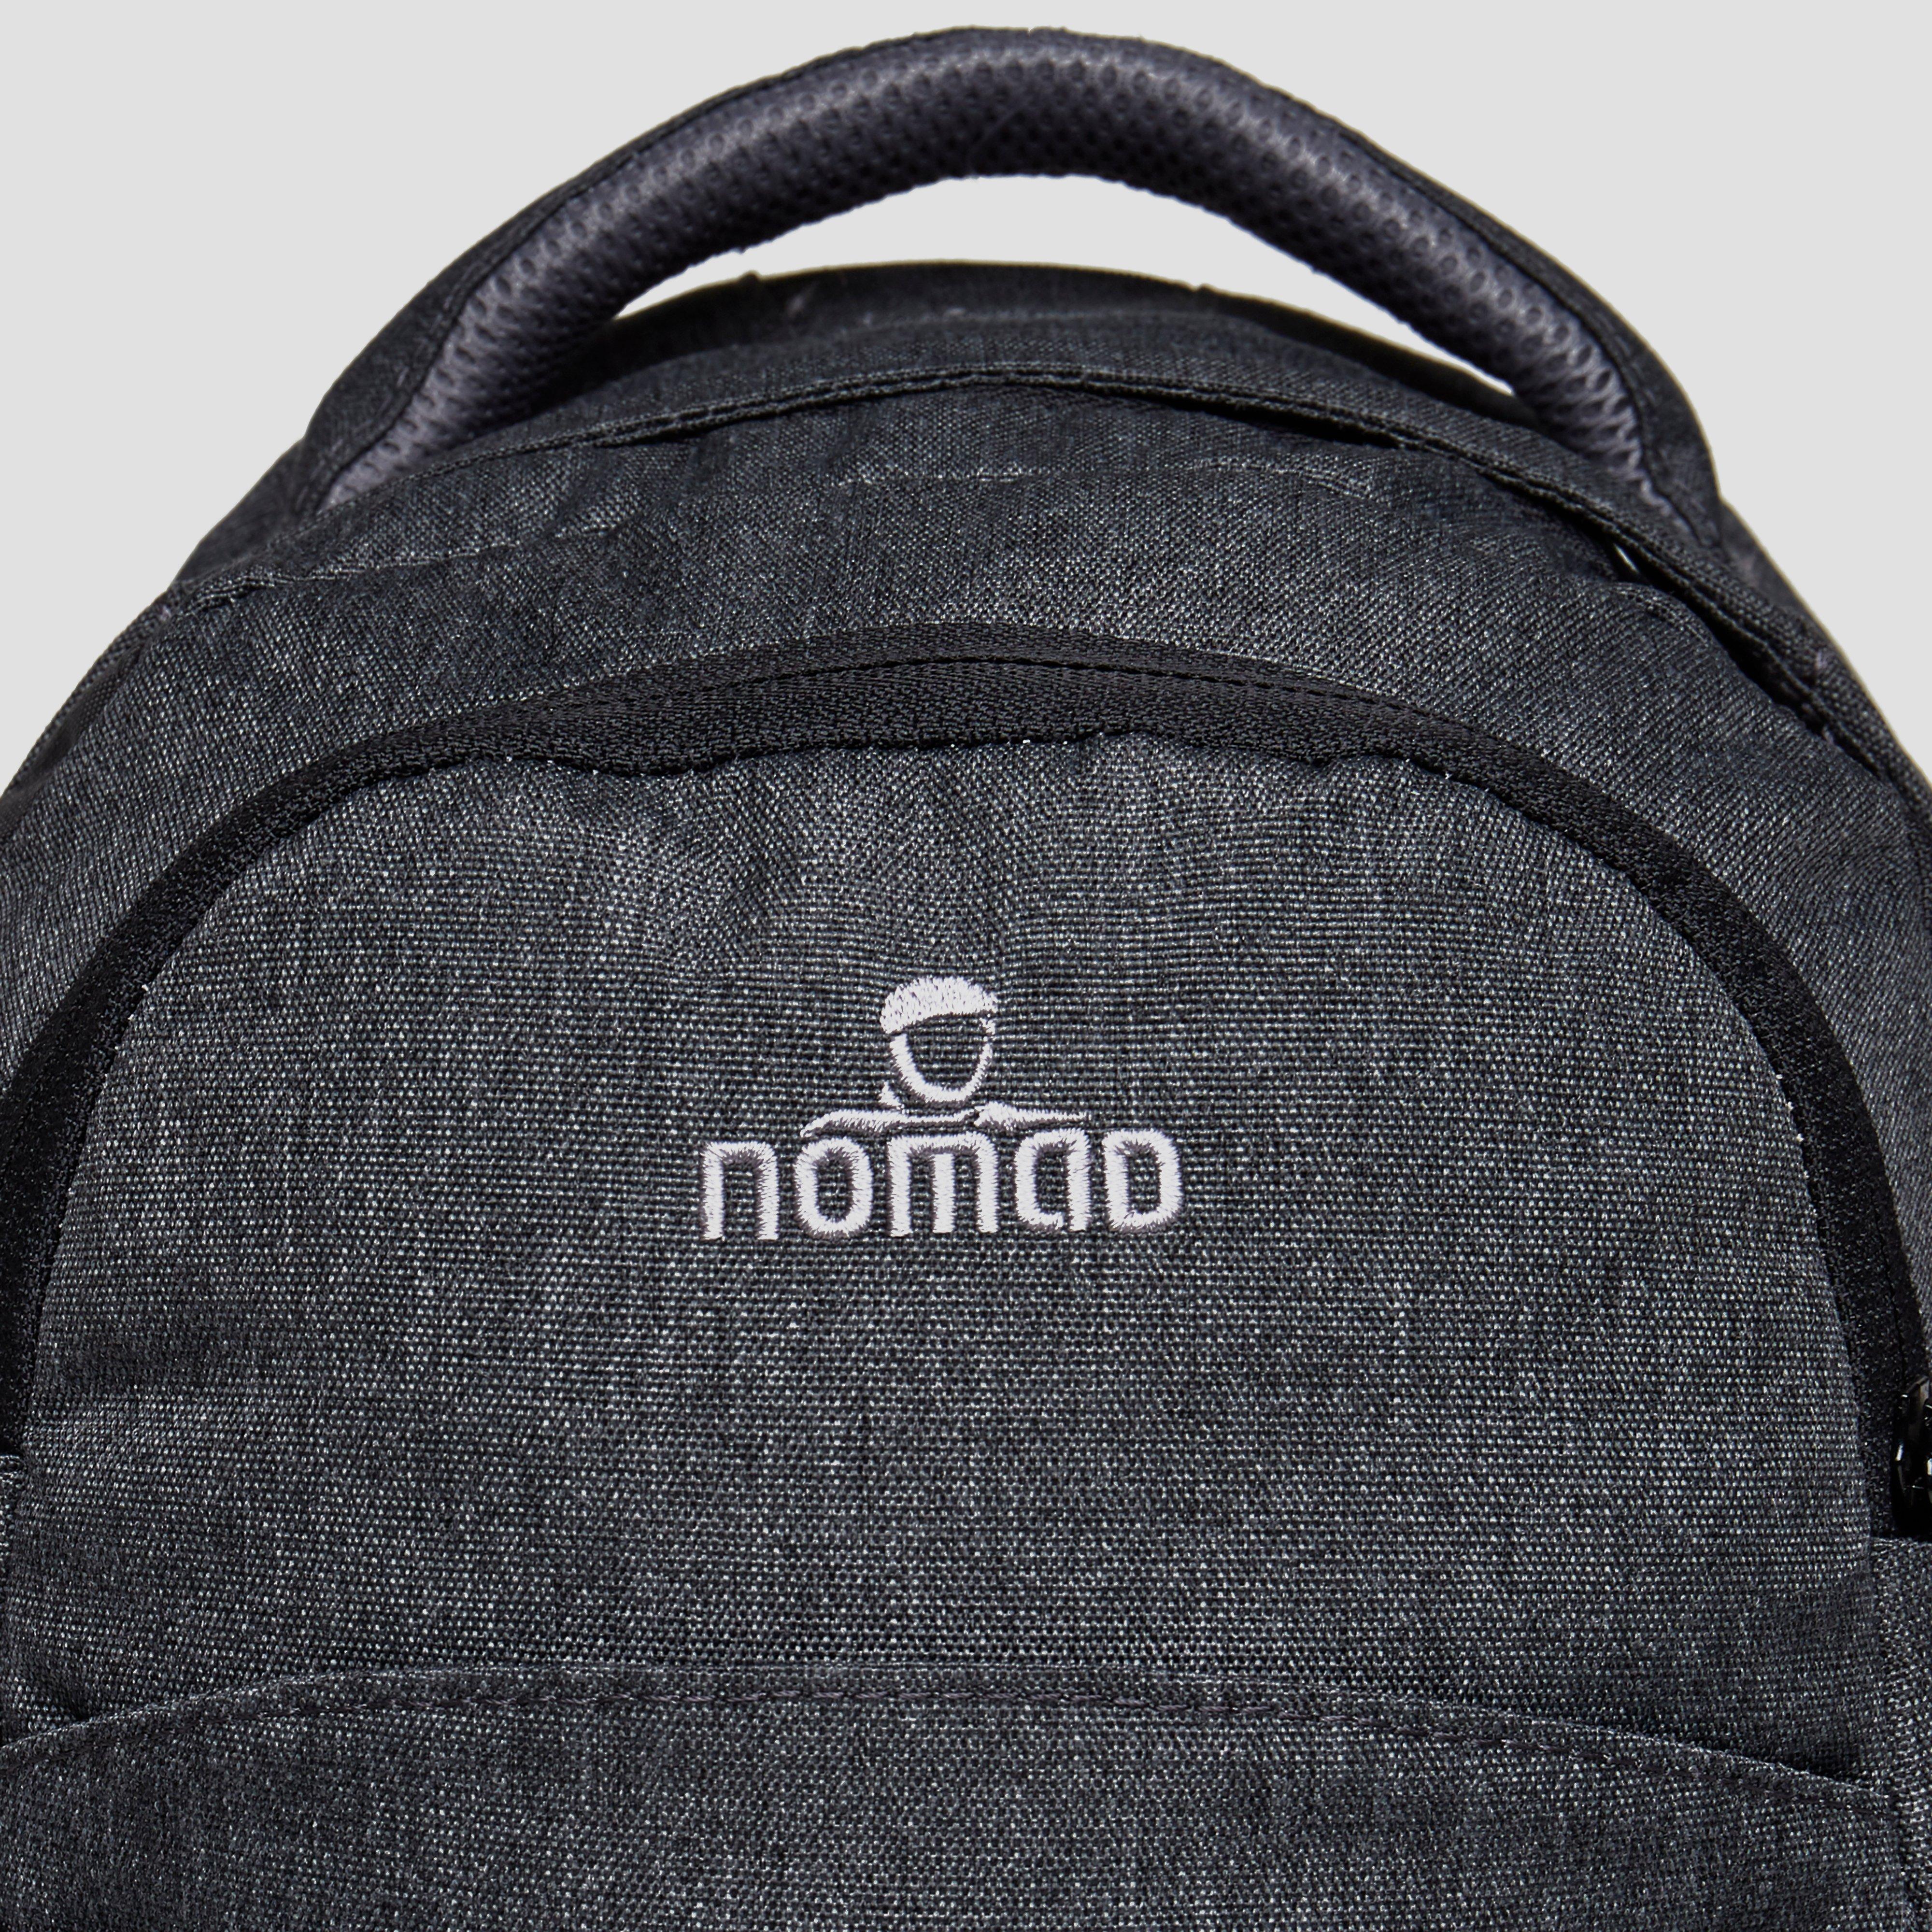 NOMAD BARITE TOURPACK 18 LITER GRIJS